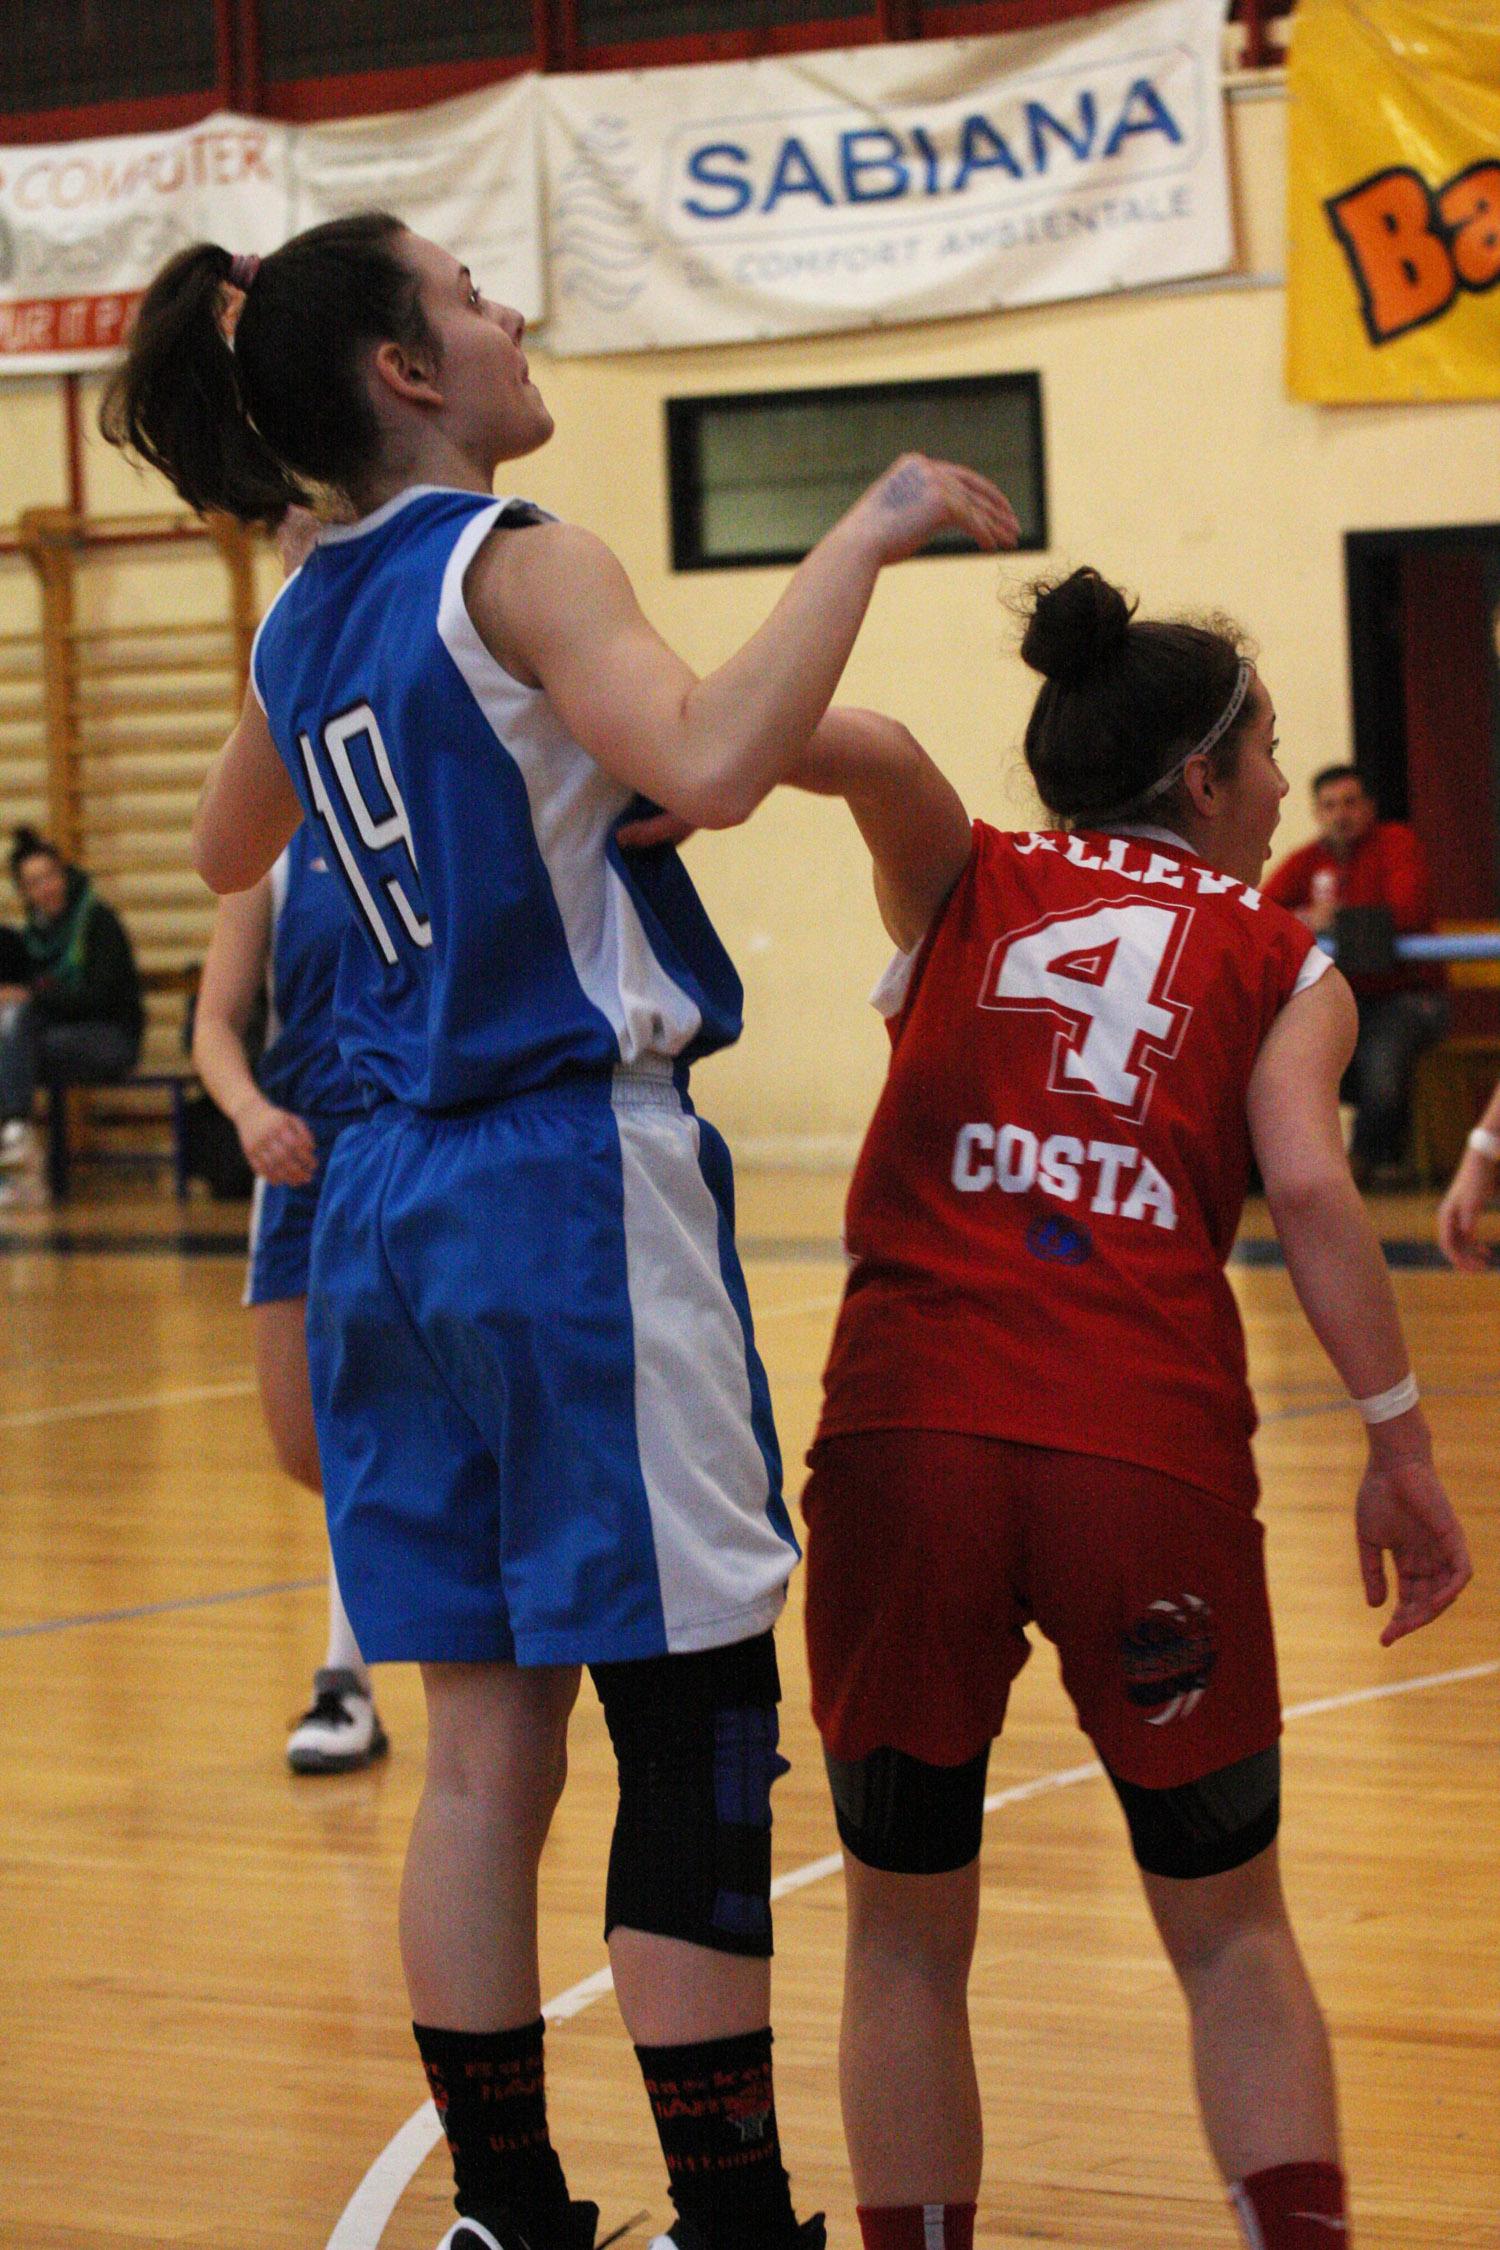 U16 01 - Vittuone vs Costa Masnaga 29.JPG